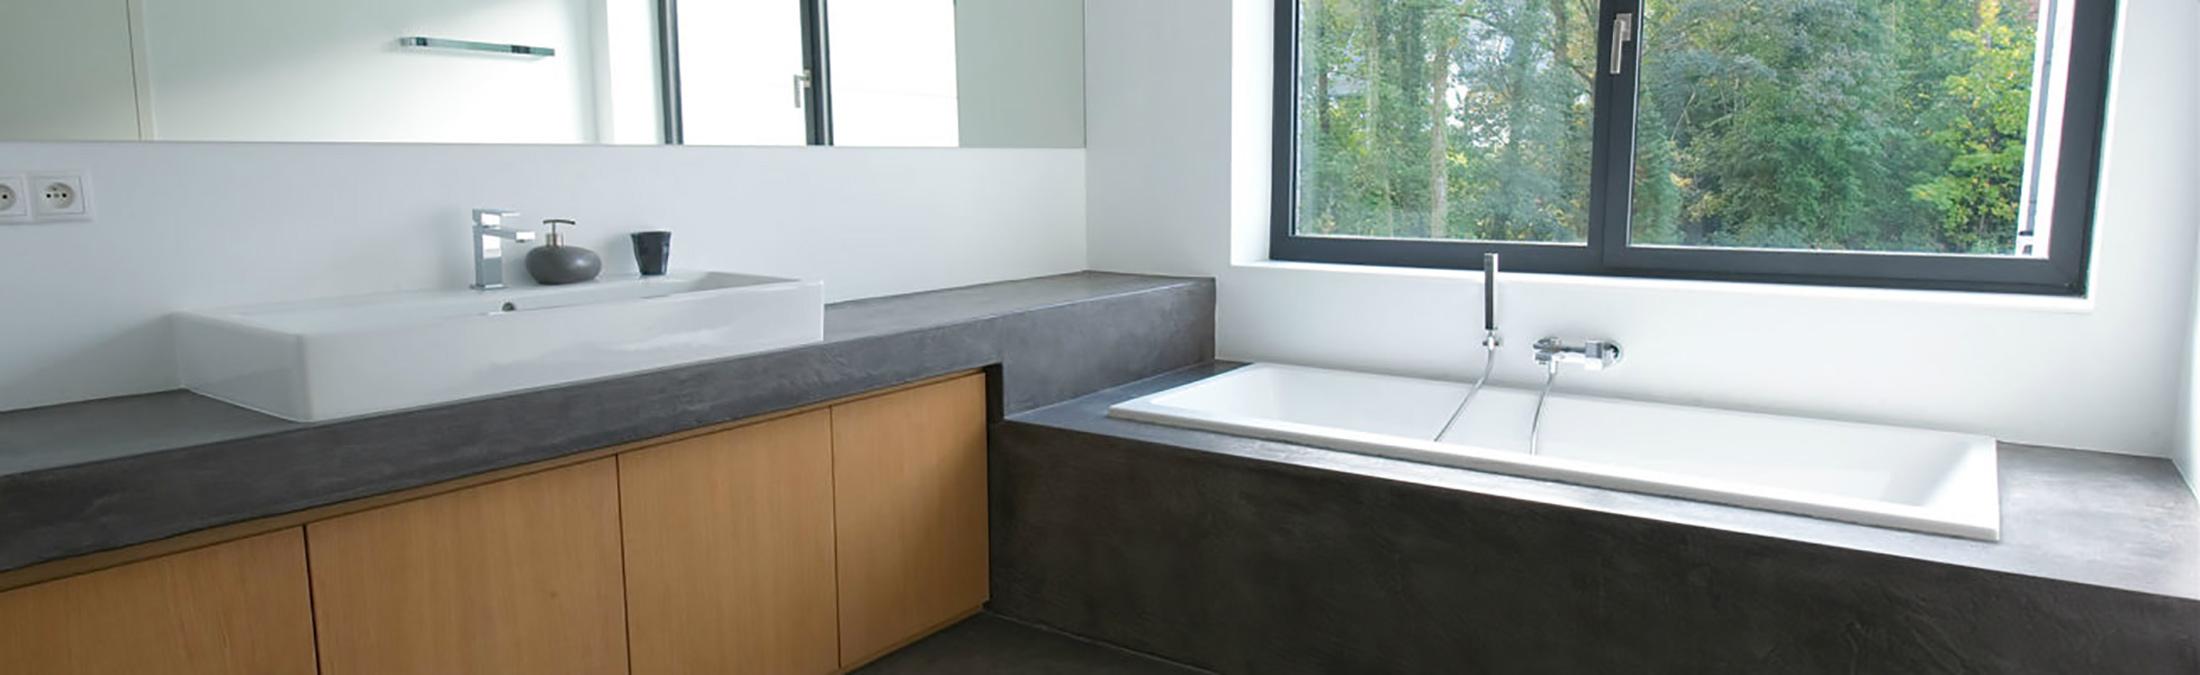 Salle De Bain Nivelles ~ design sur mesure mortex salle de bains